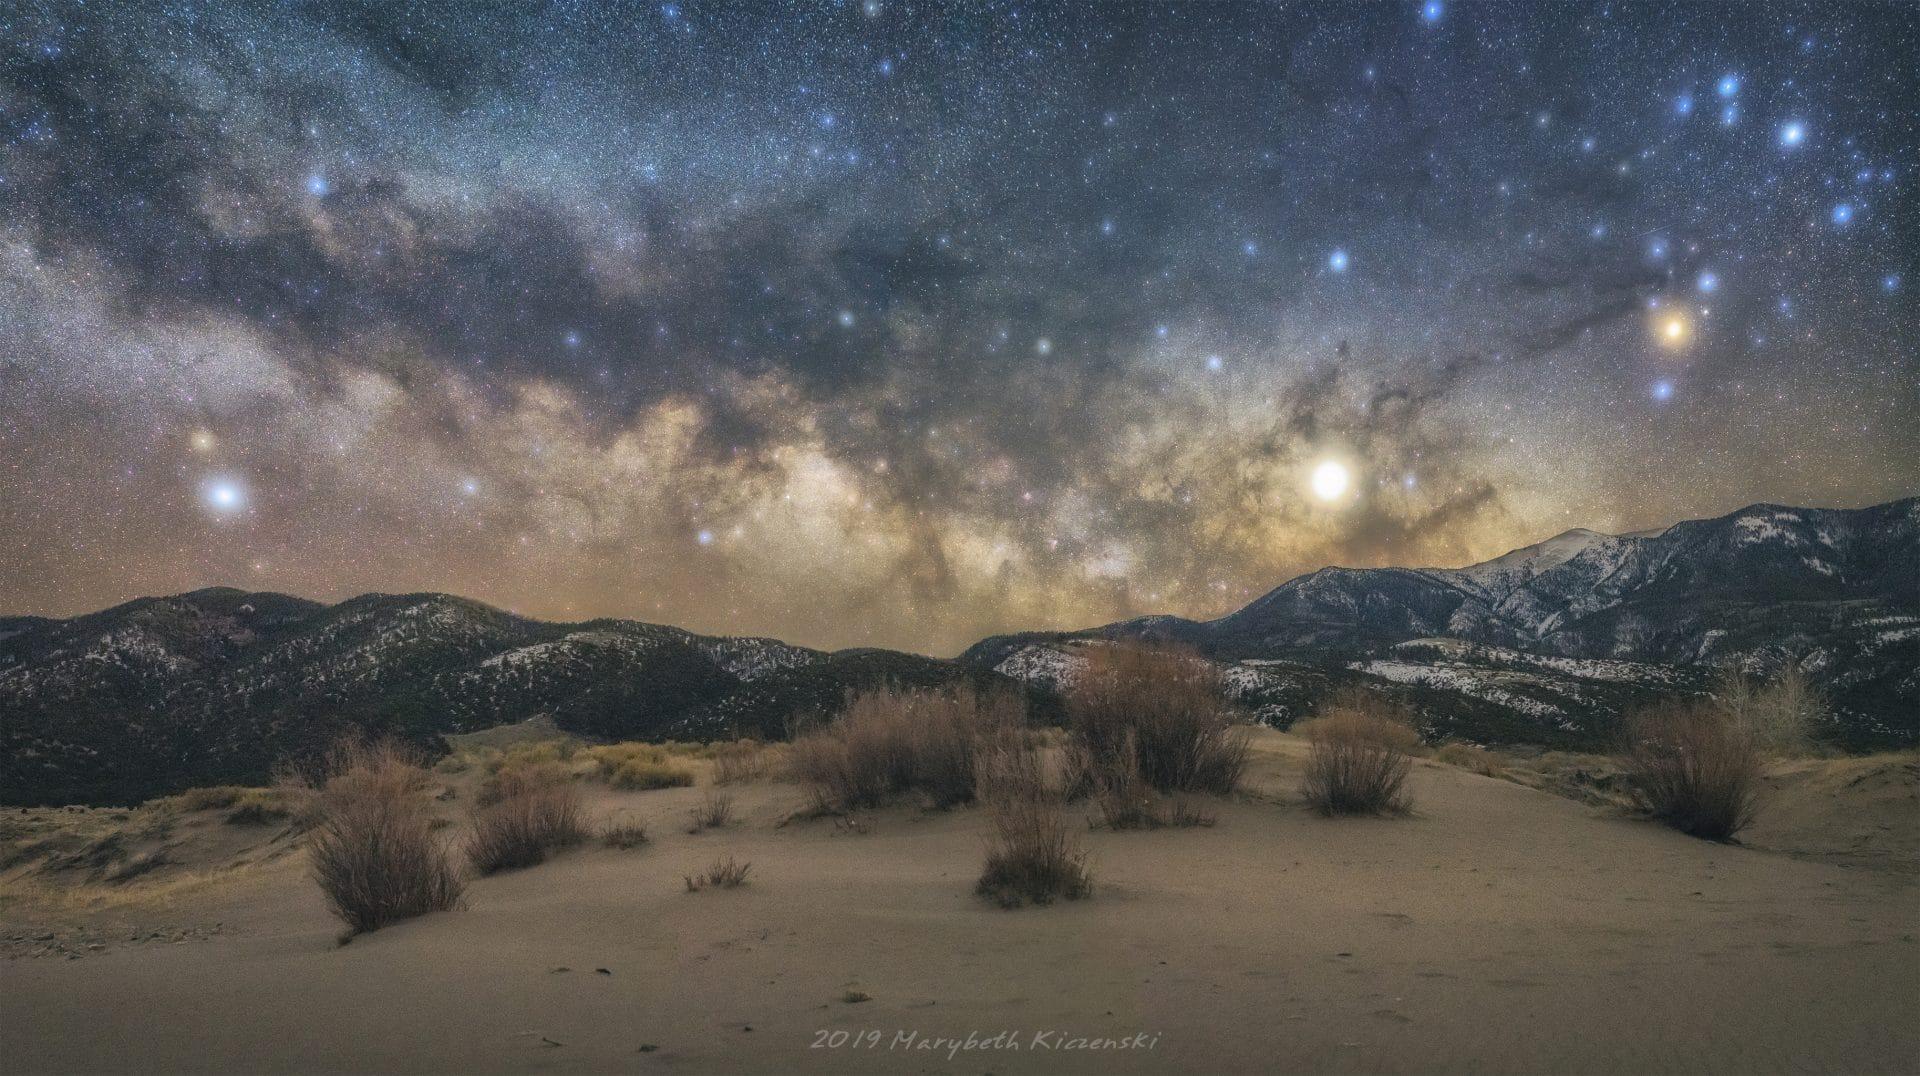 2019 Copyright MaryBeth Kiczenski. Panoramic image taken with a Nikon D850 and the Sigma ART 1.4 35mm lens.